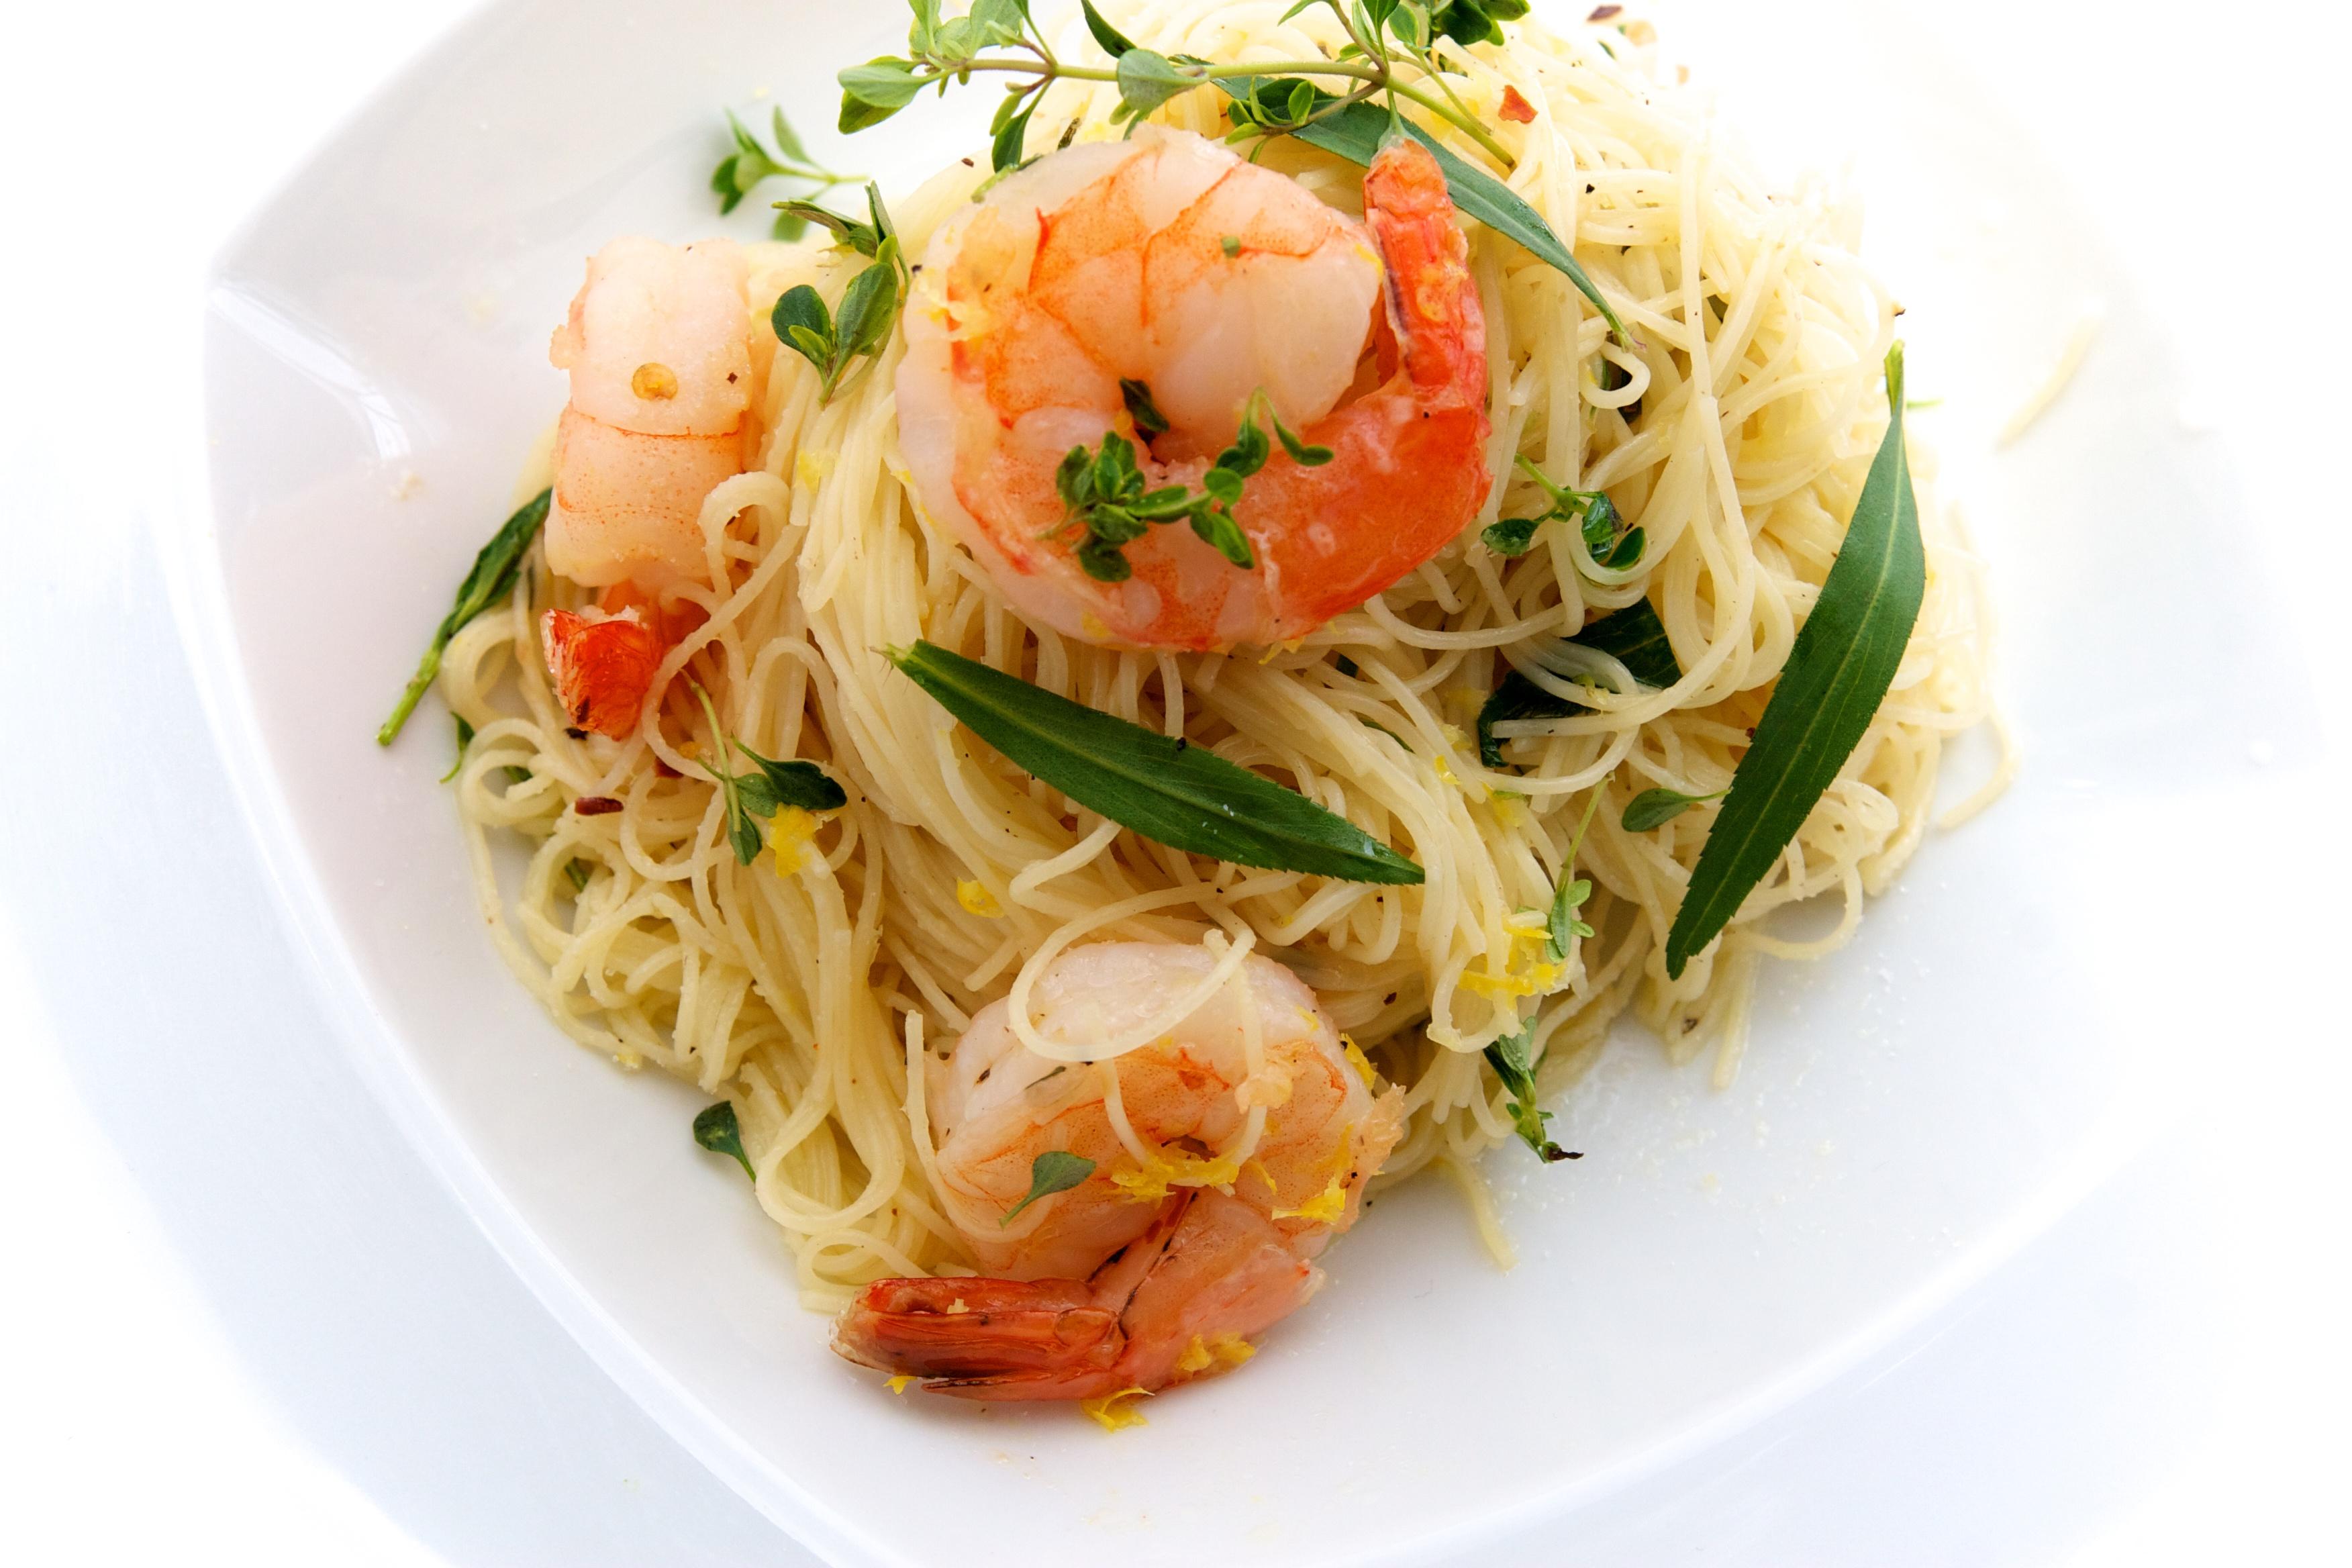 Fresh Pasta With Prawns And Lemon Oil Recipes — Dishmaps